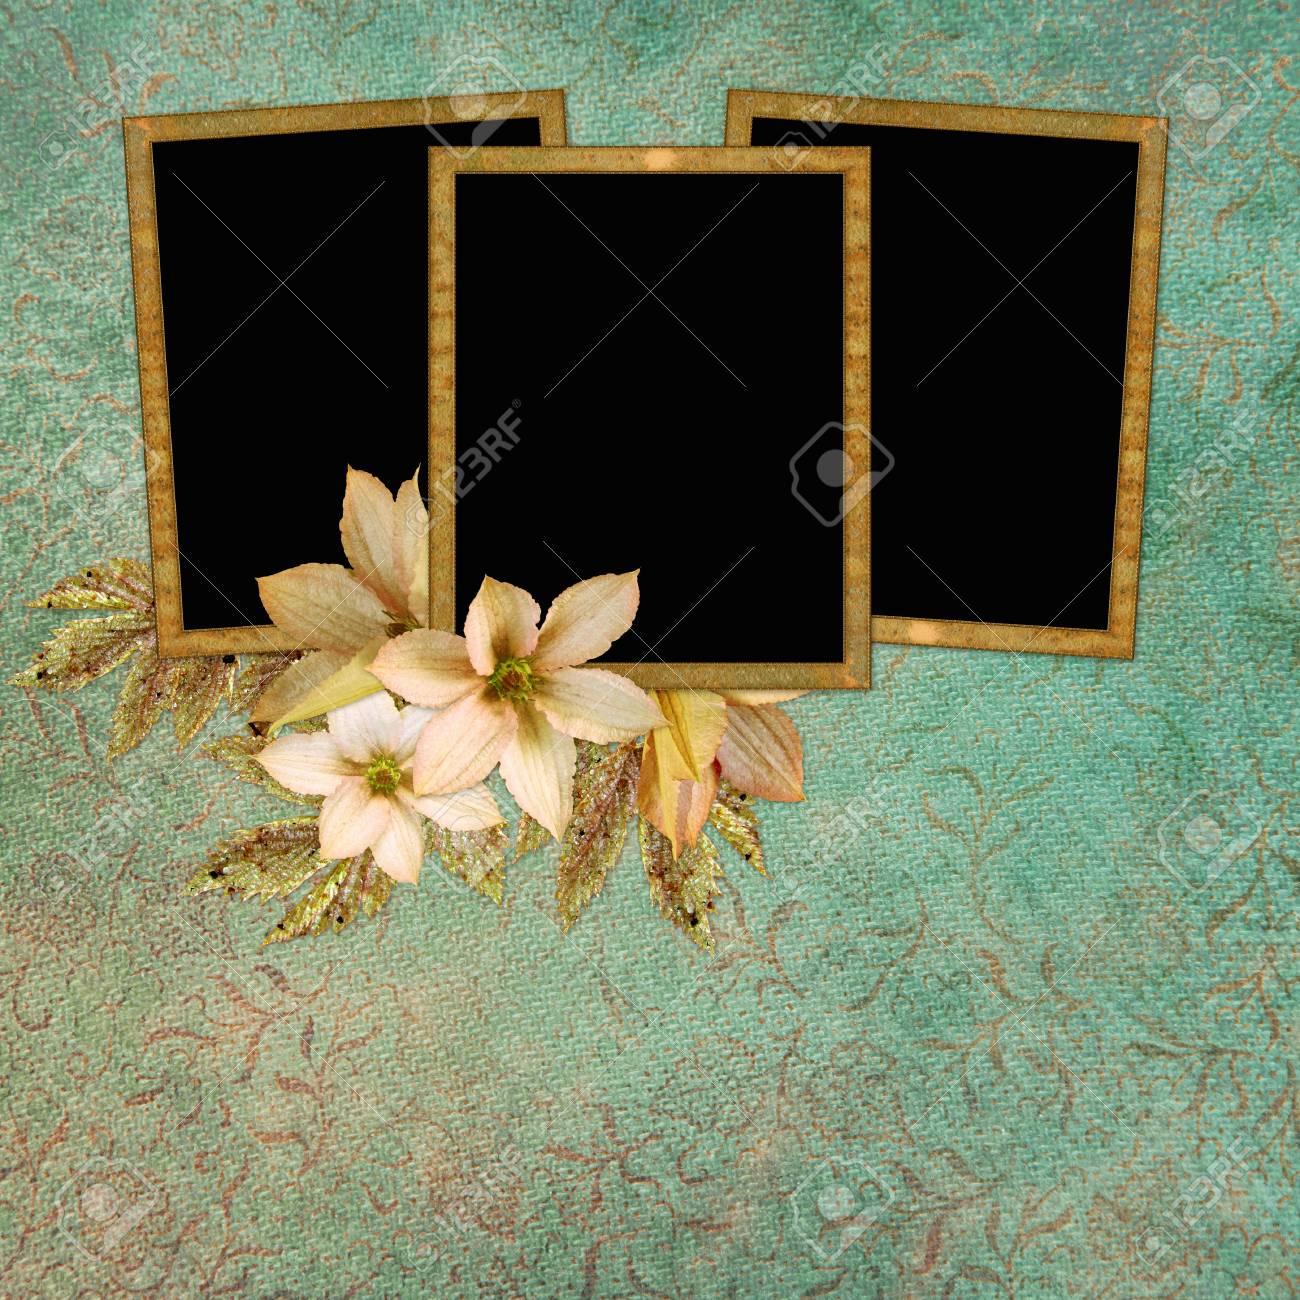 Framework for photo or congratulation. Stock Photo - 8990699